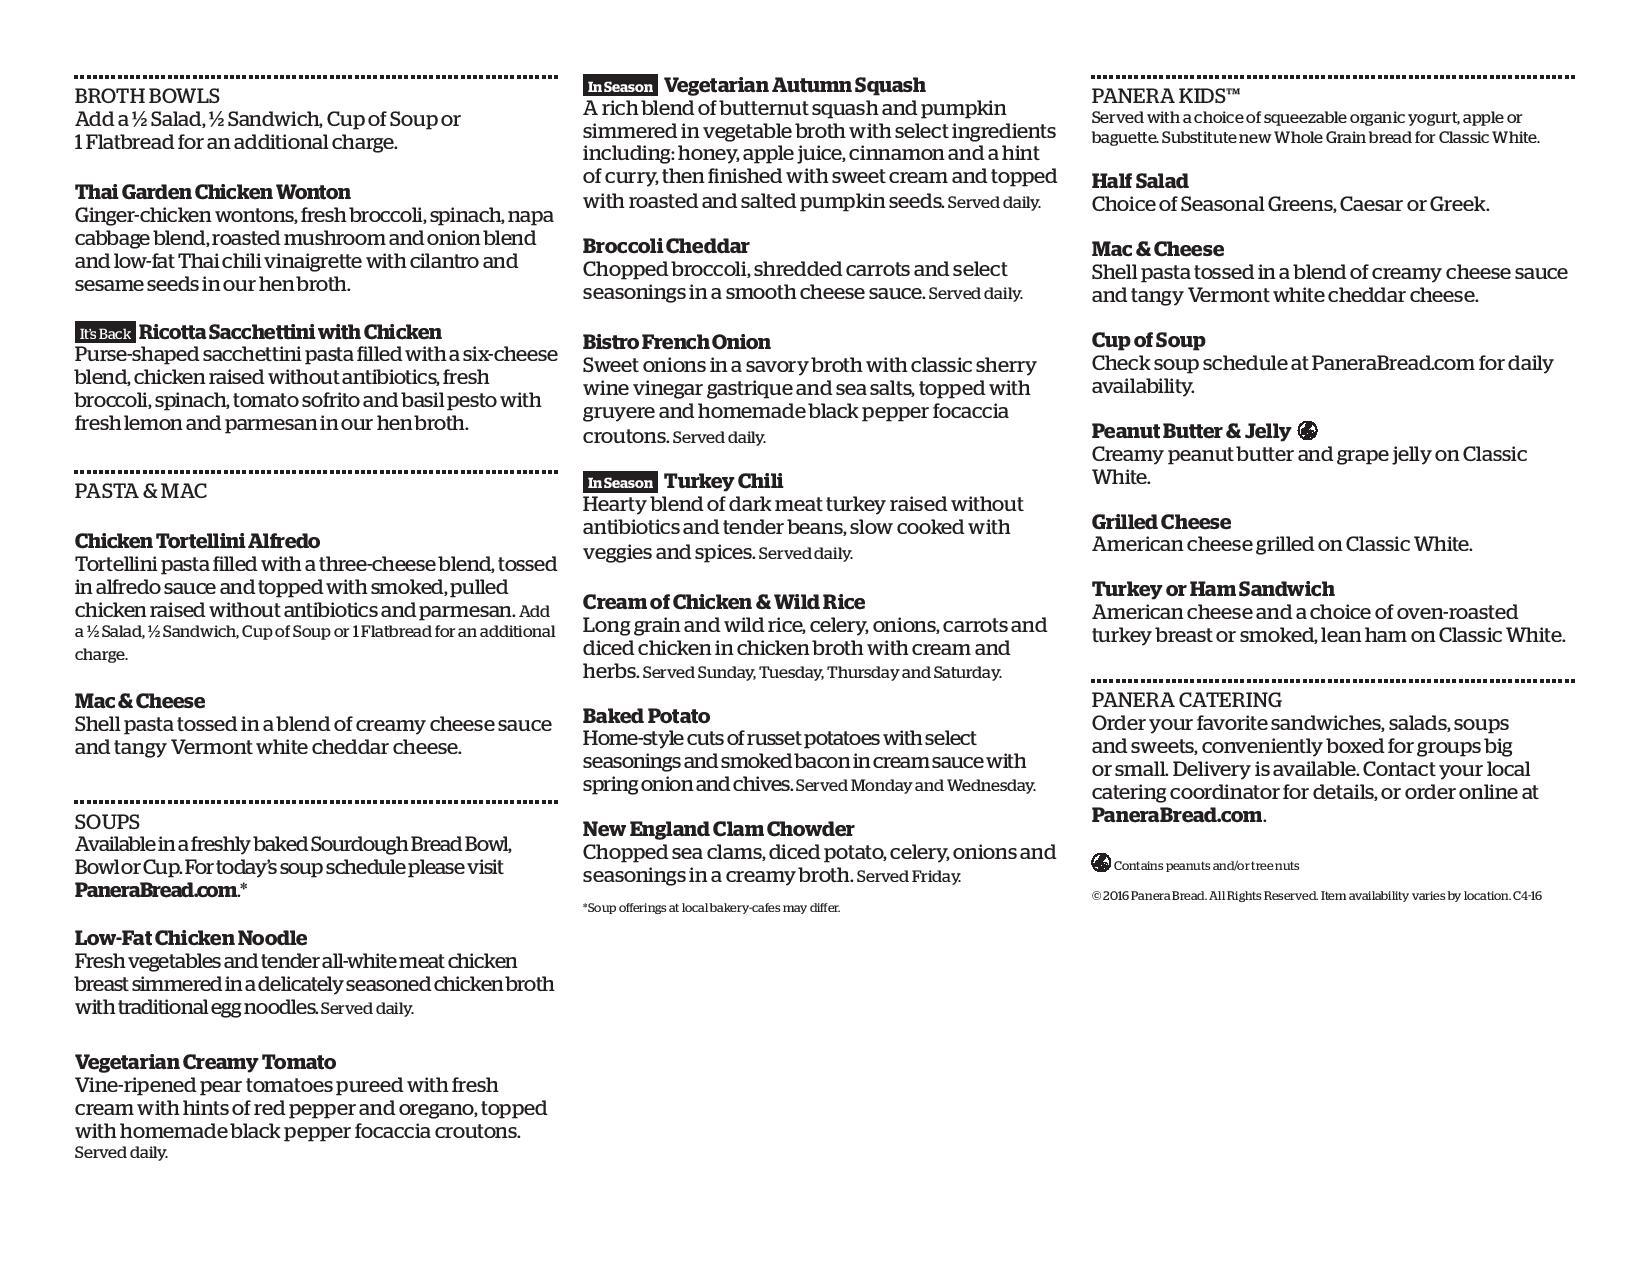 menu-retail-1-page-004